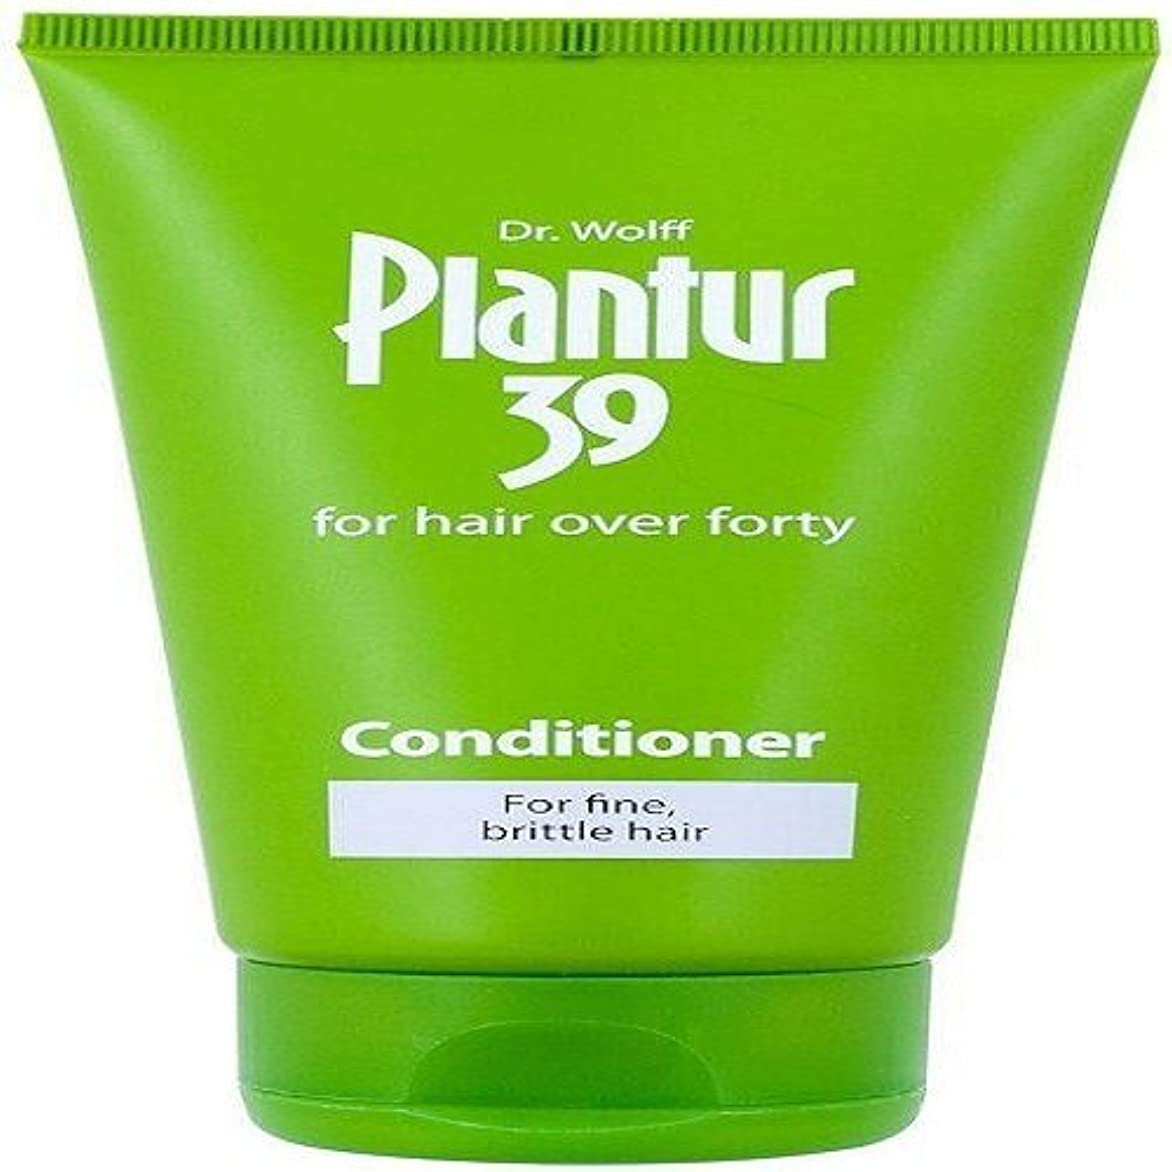 業界花瓶蛇行Plantur 39 150ml Fine & Brittle hair conditioner by Plantur